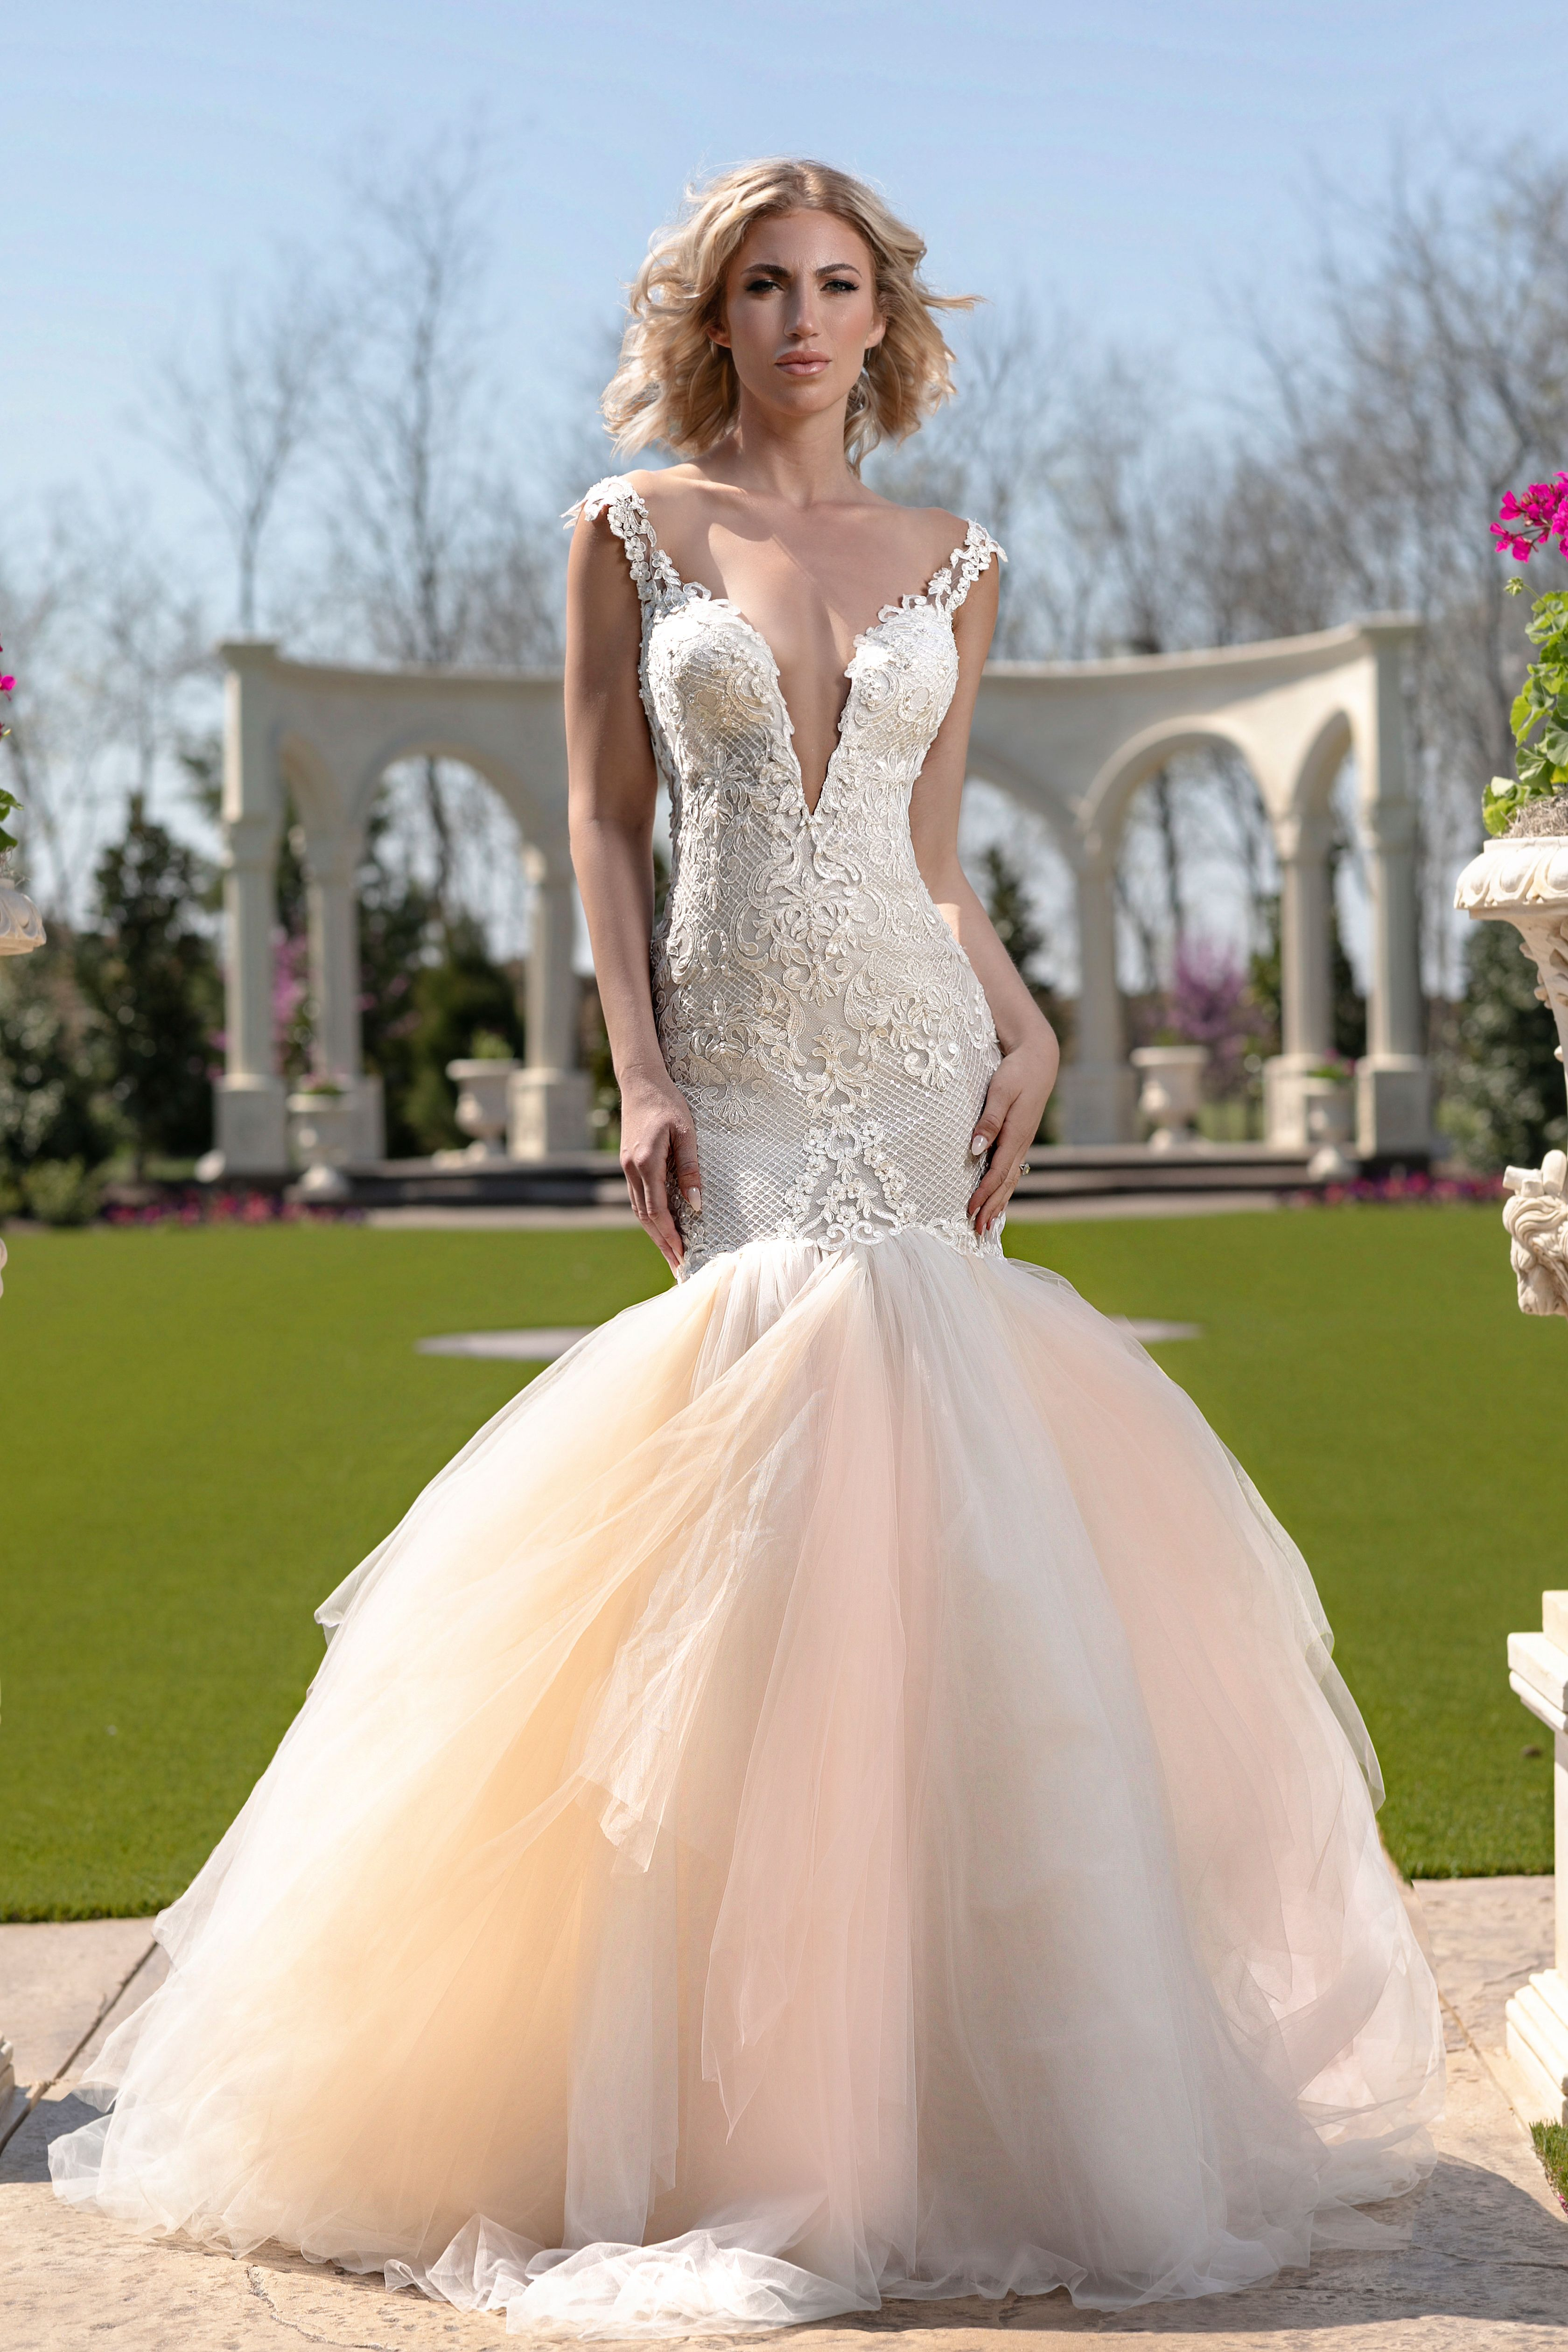 Photo courtesy of Hiram Trillo Bride, Wedding dresses